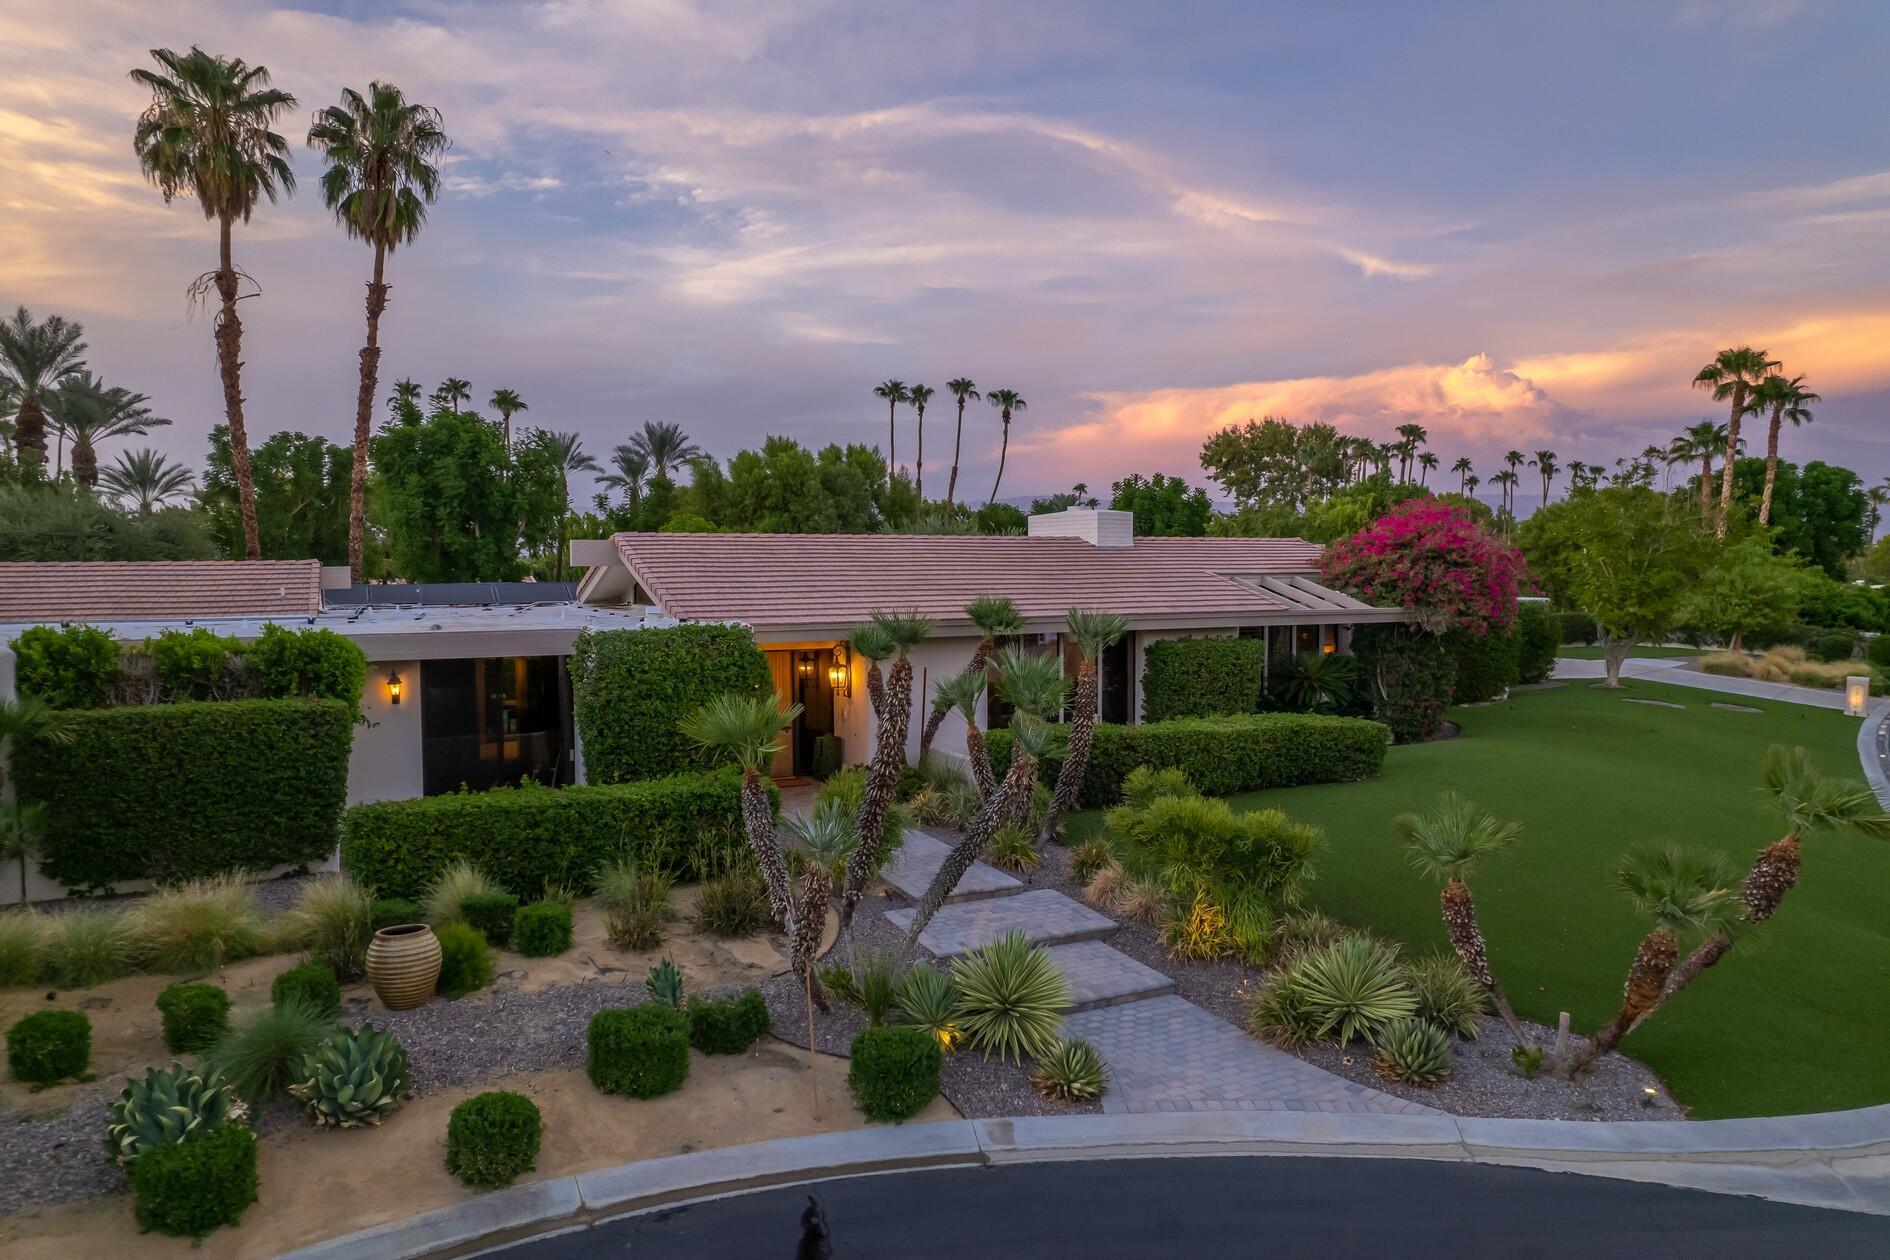 Photo of 75156 Pepperwood Drive, Indian Wells, CA 92210